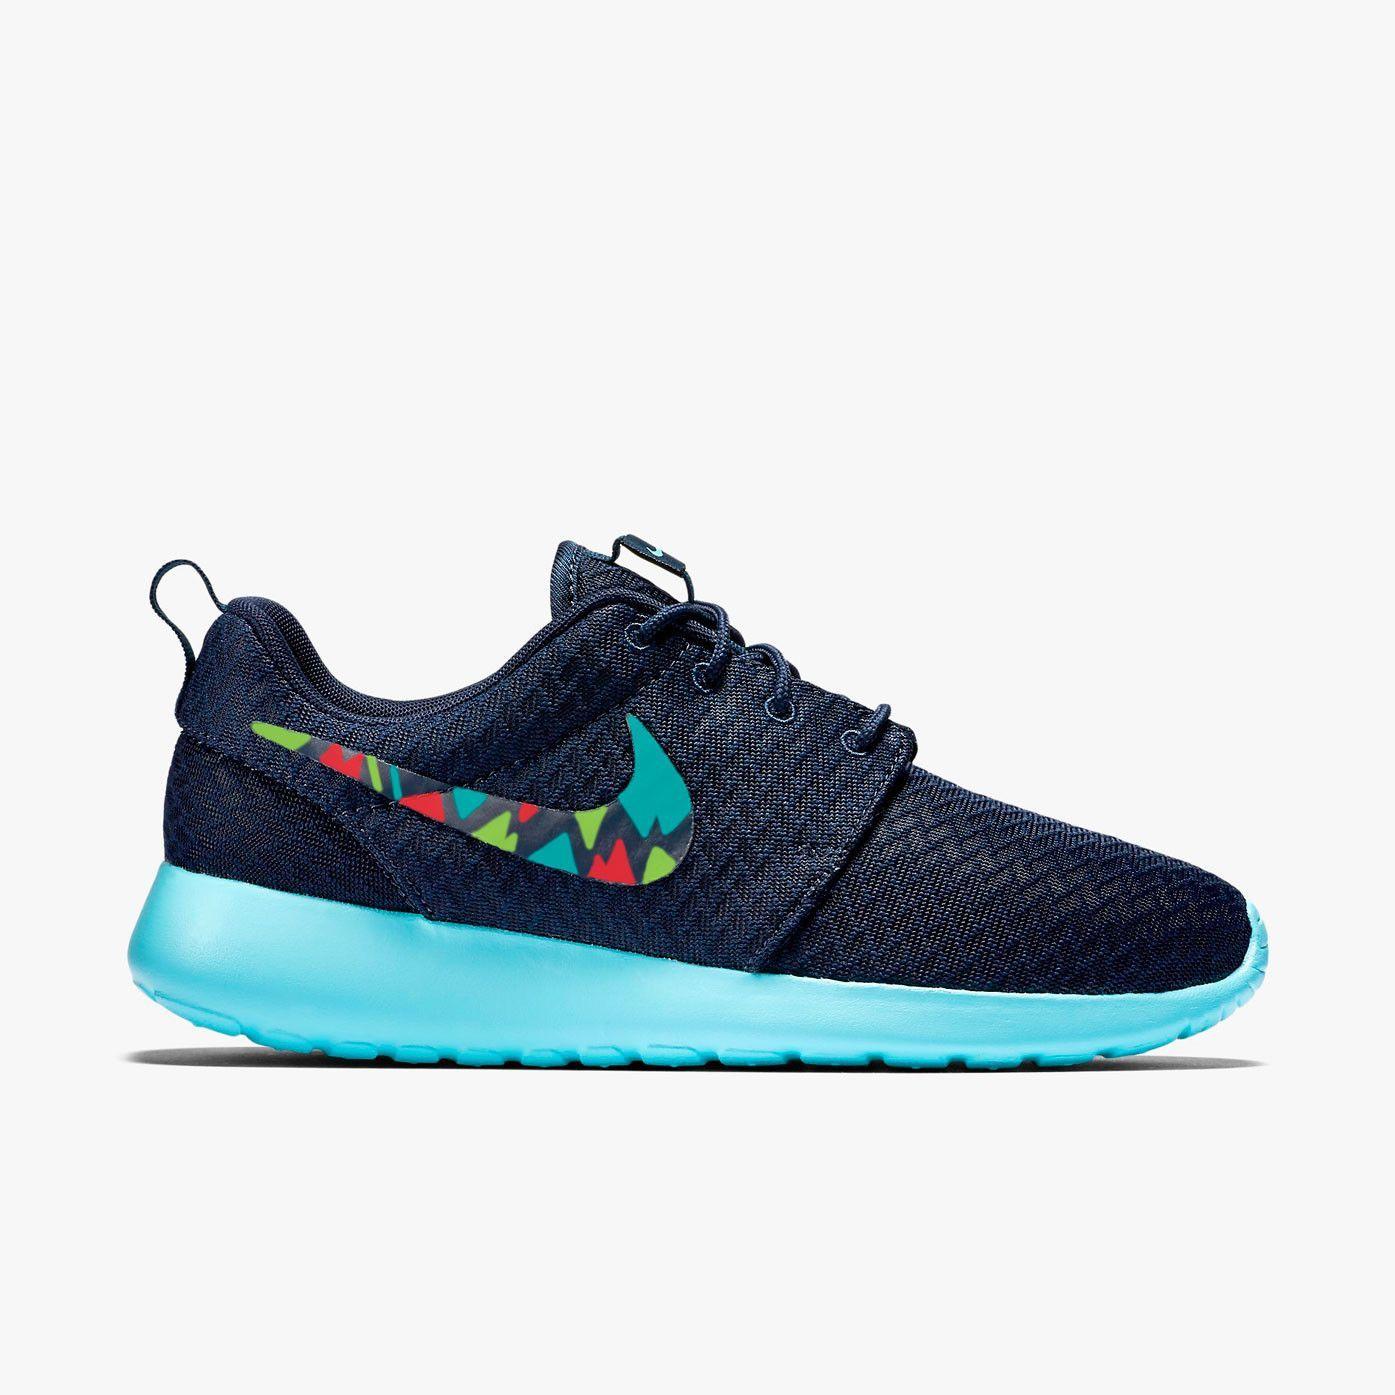 17728695e85a ... Nike Huarache Custom Floral for Women